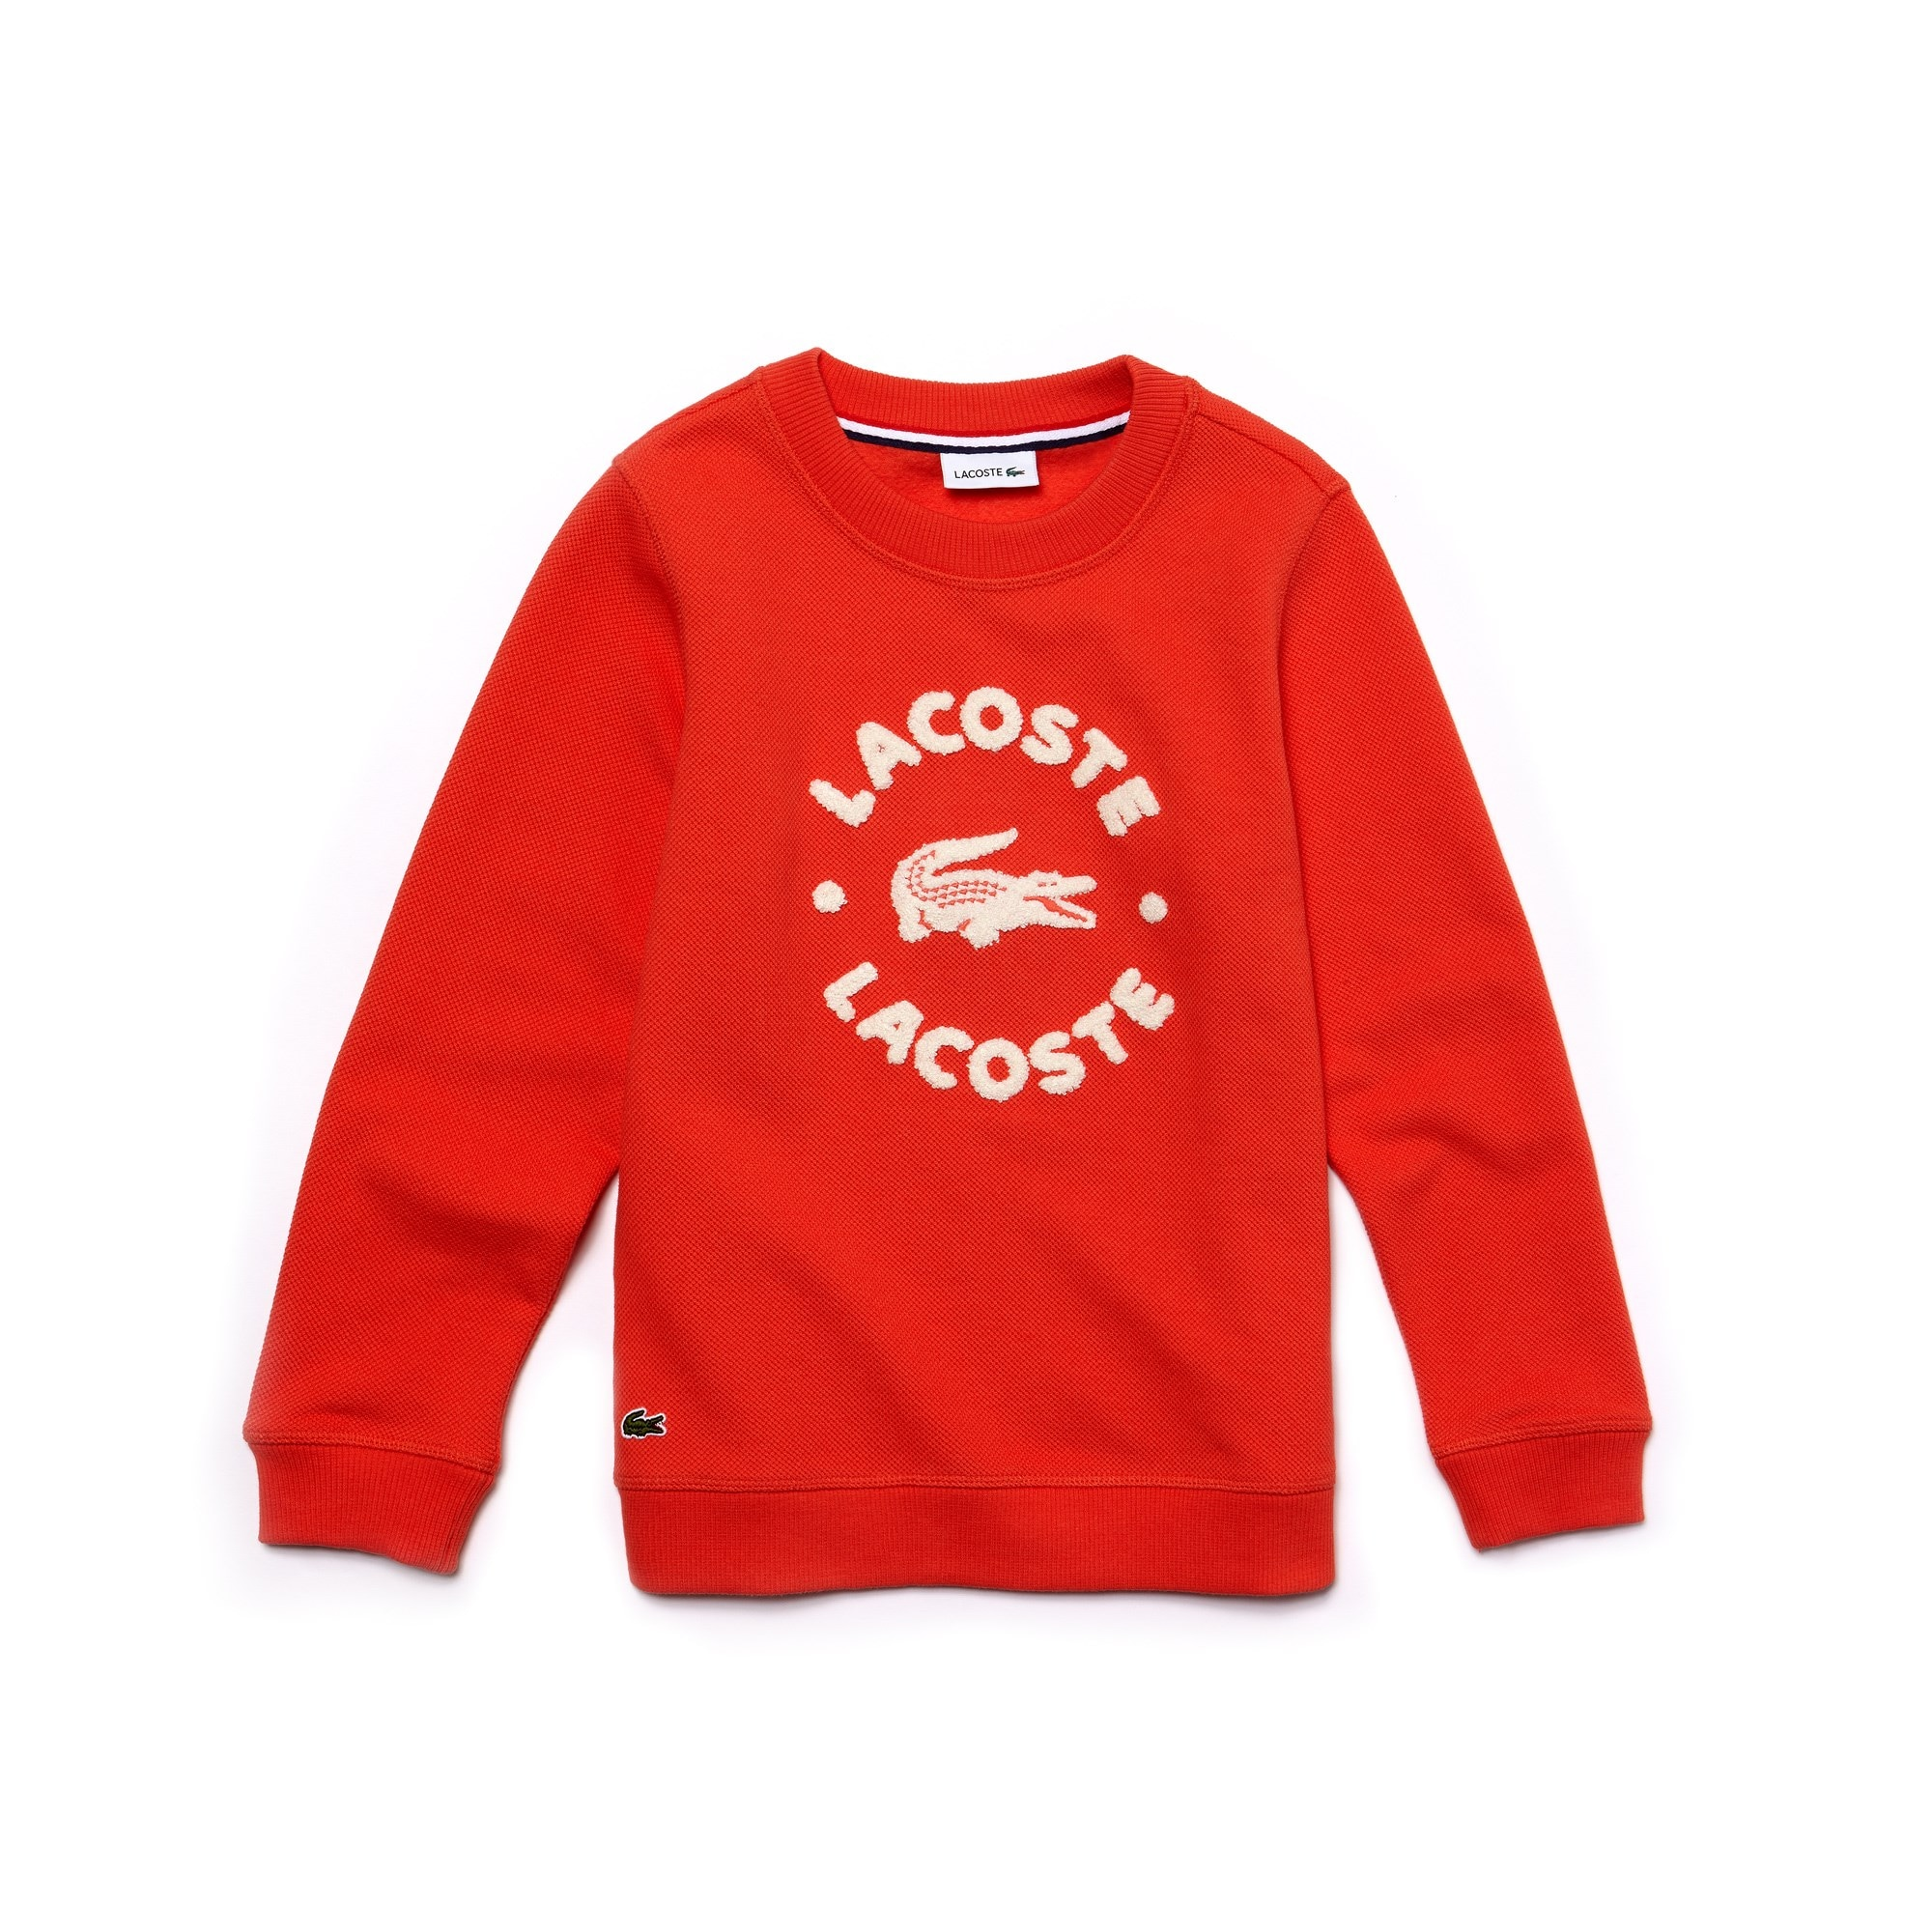 Sweatshirt col rond Garçon en molleton avec marquage Lacoste